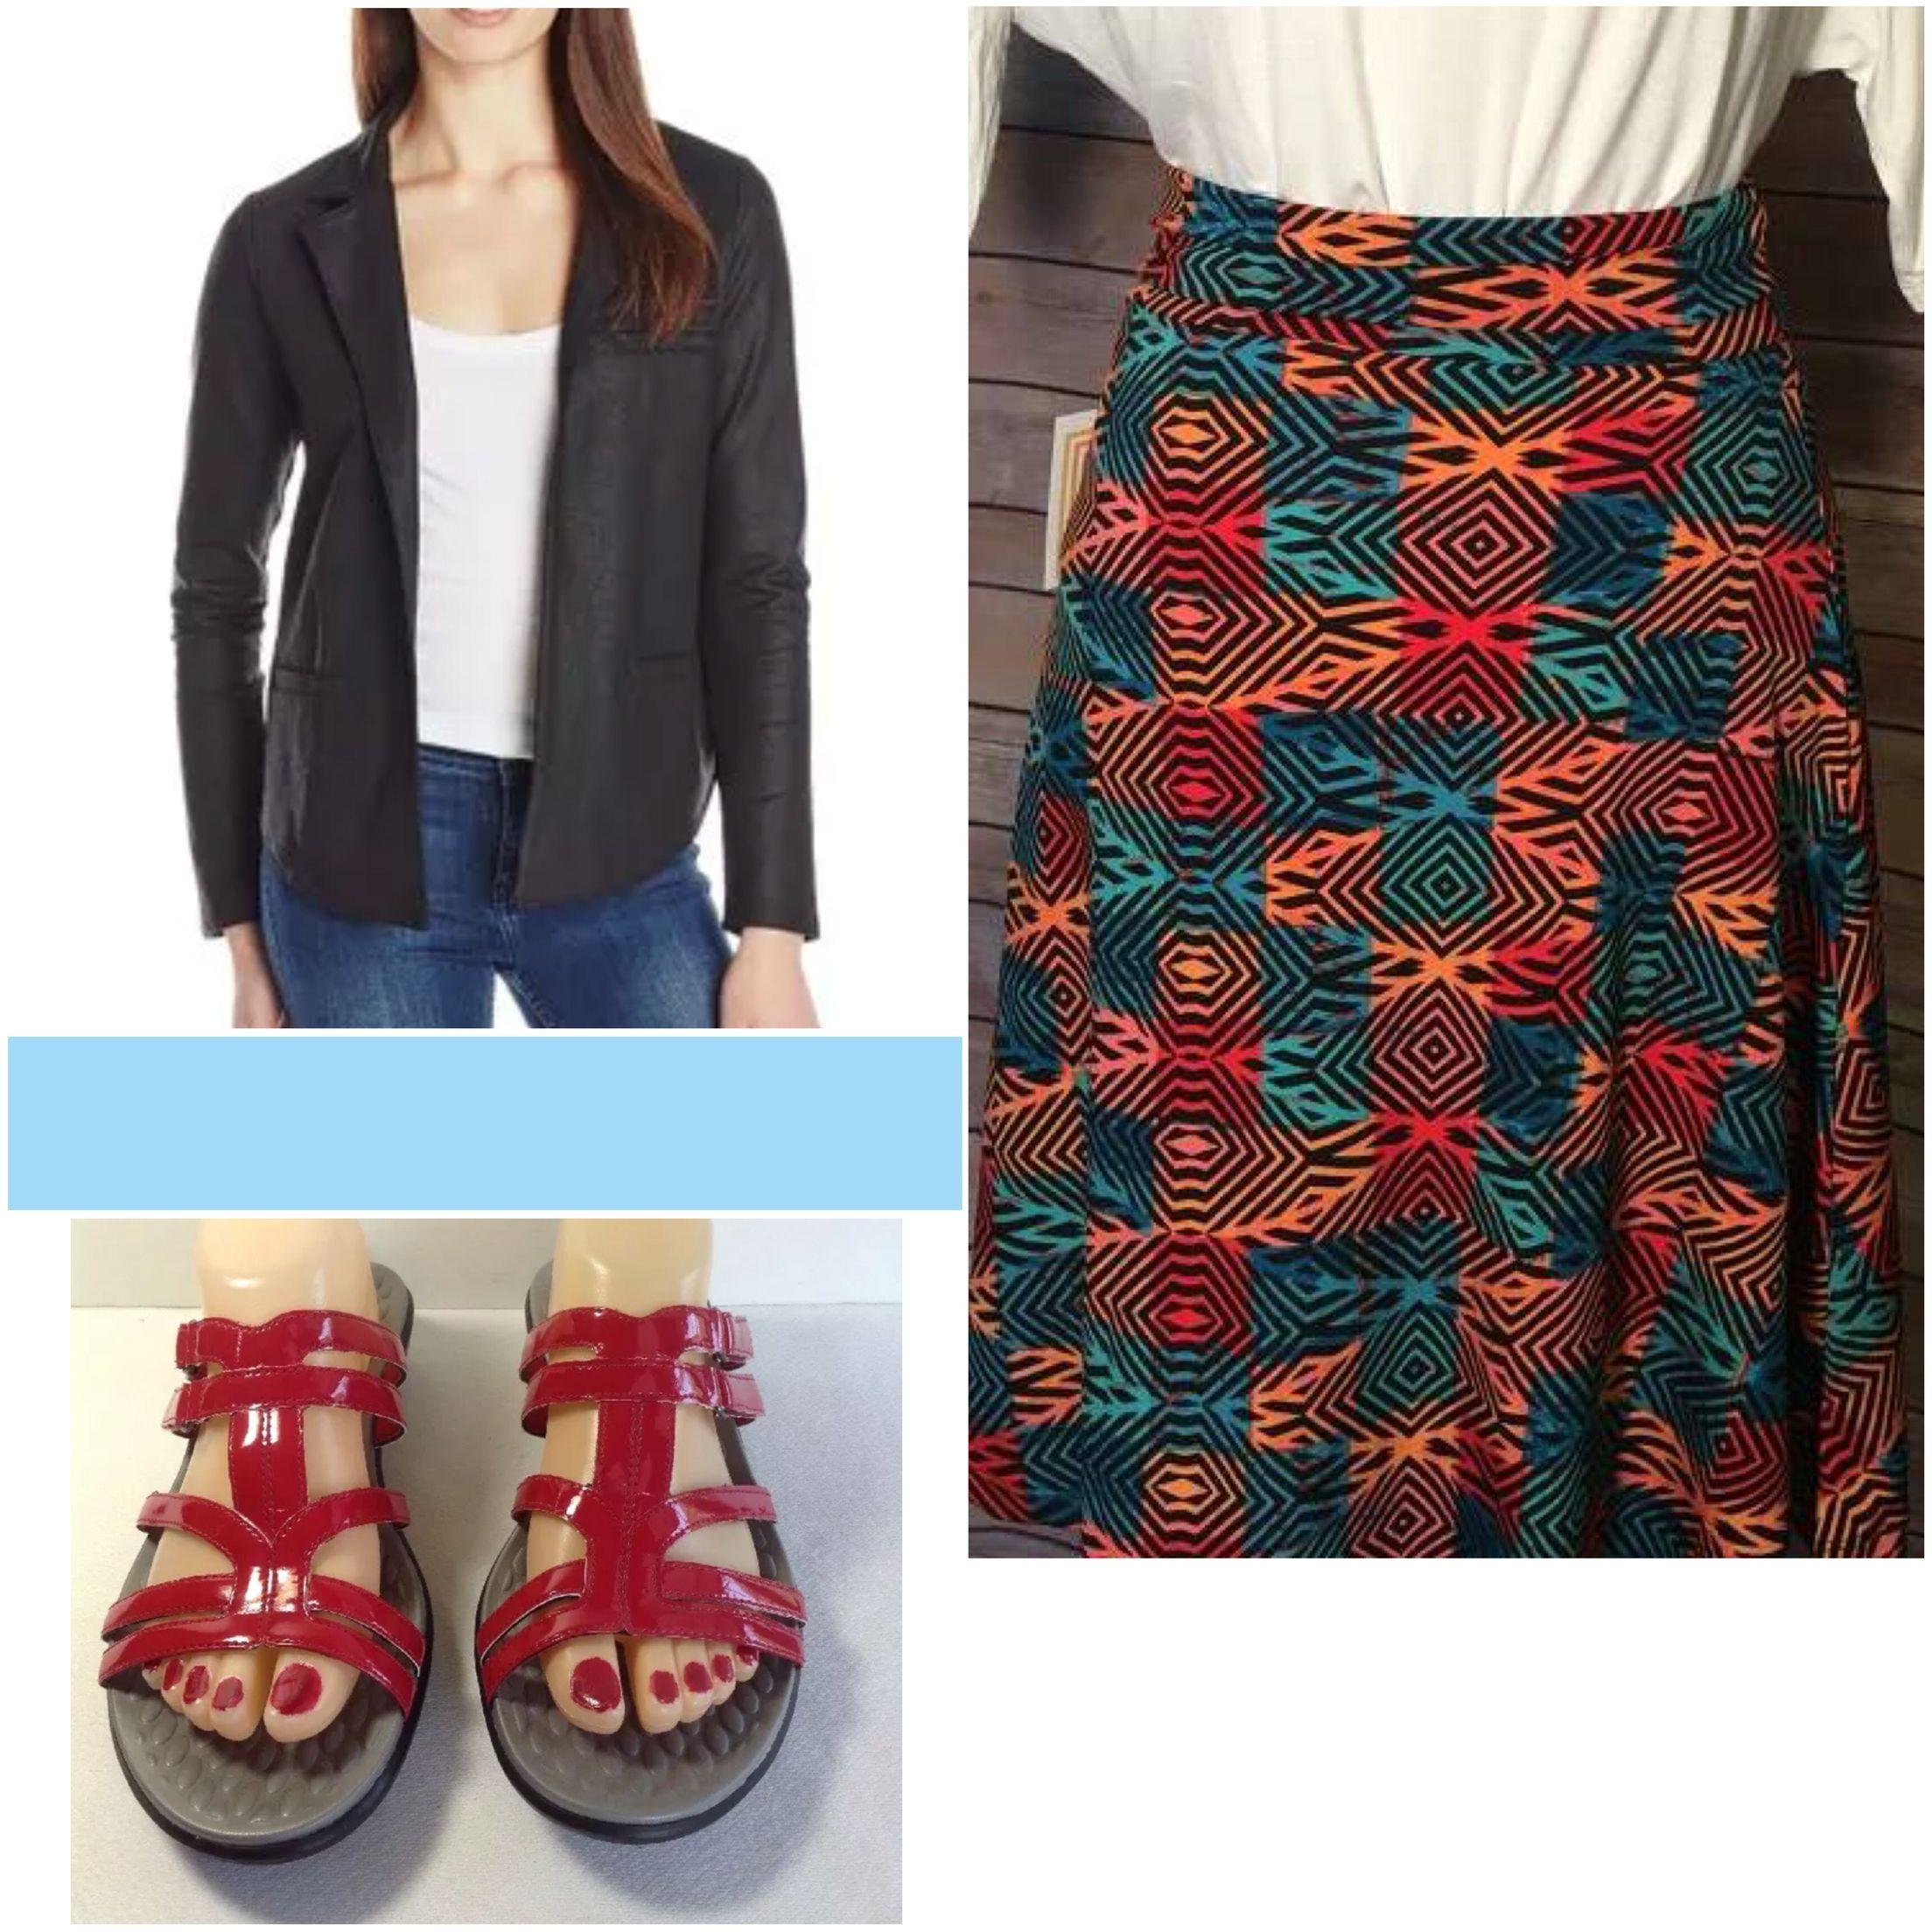 Lucky Brand blazer, Lularoe Azure and Berry sandals